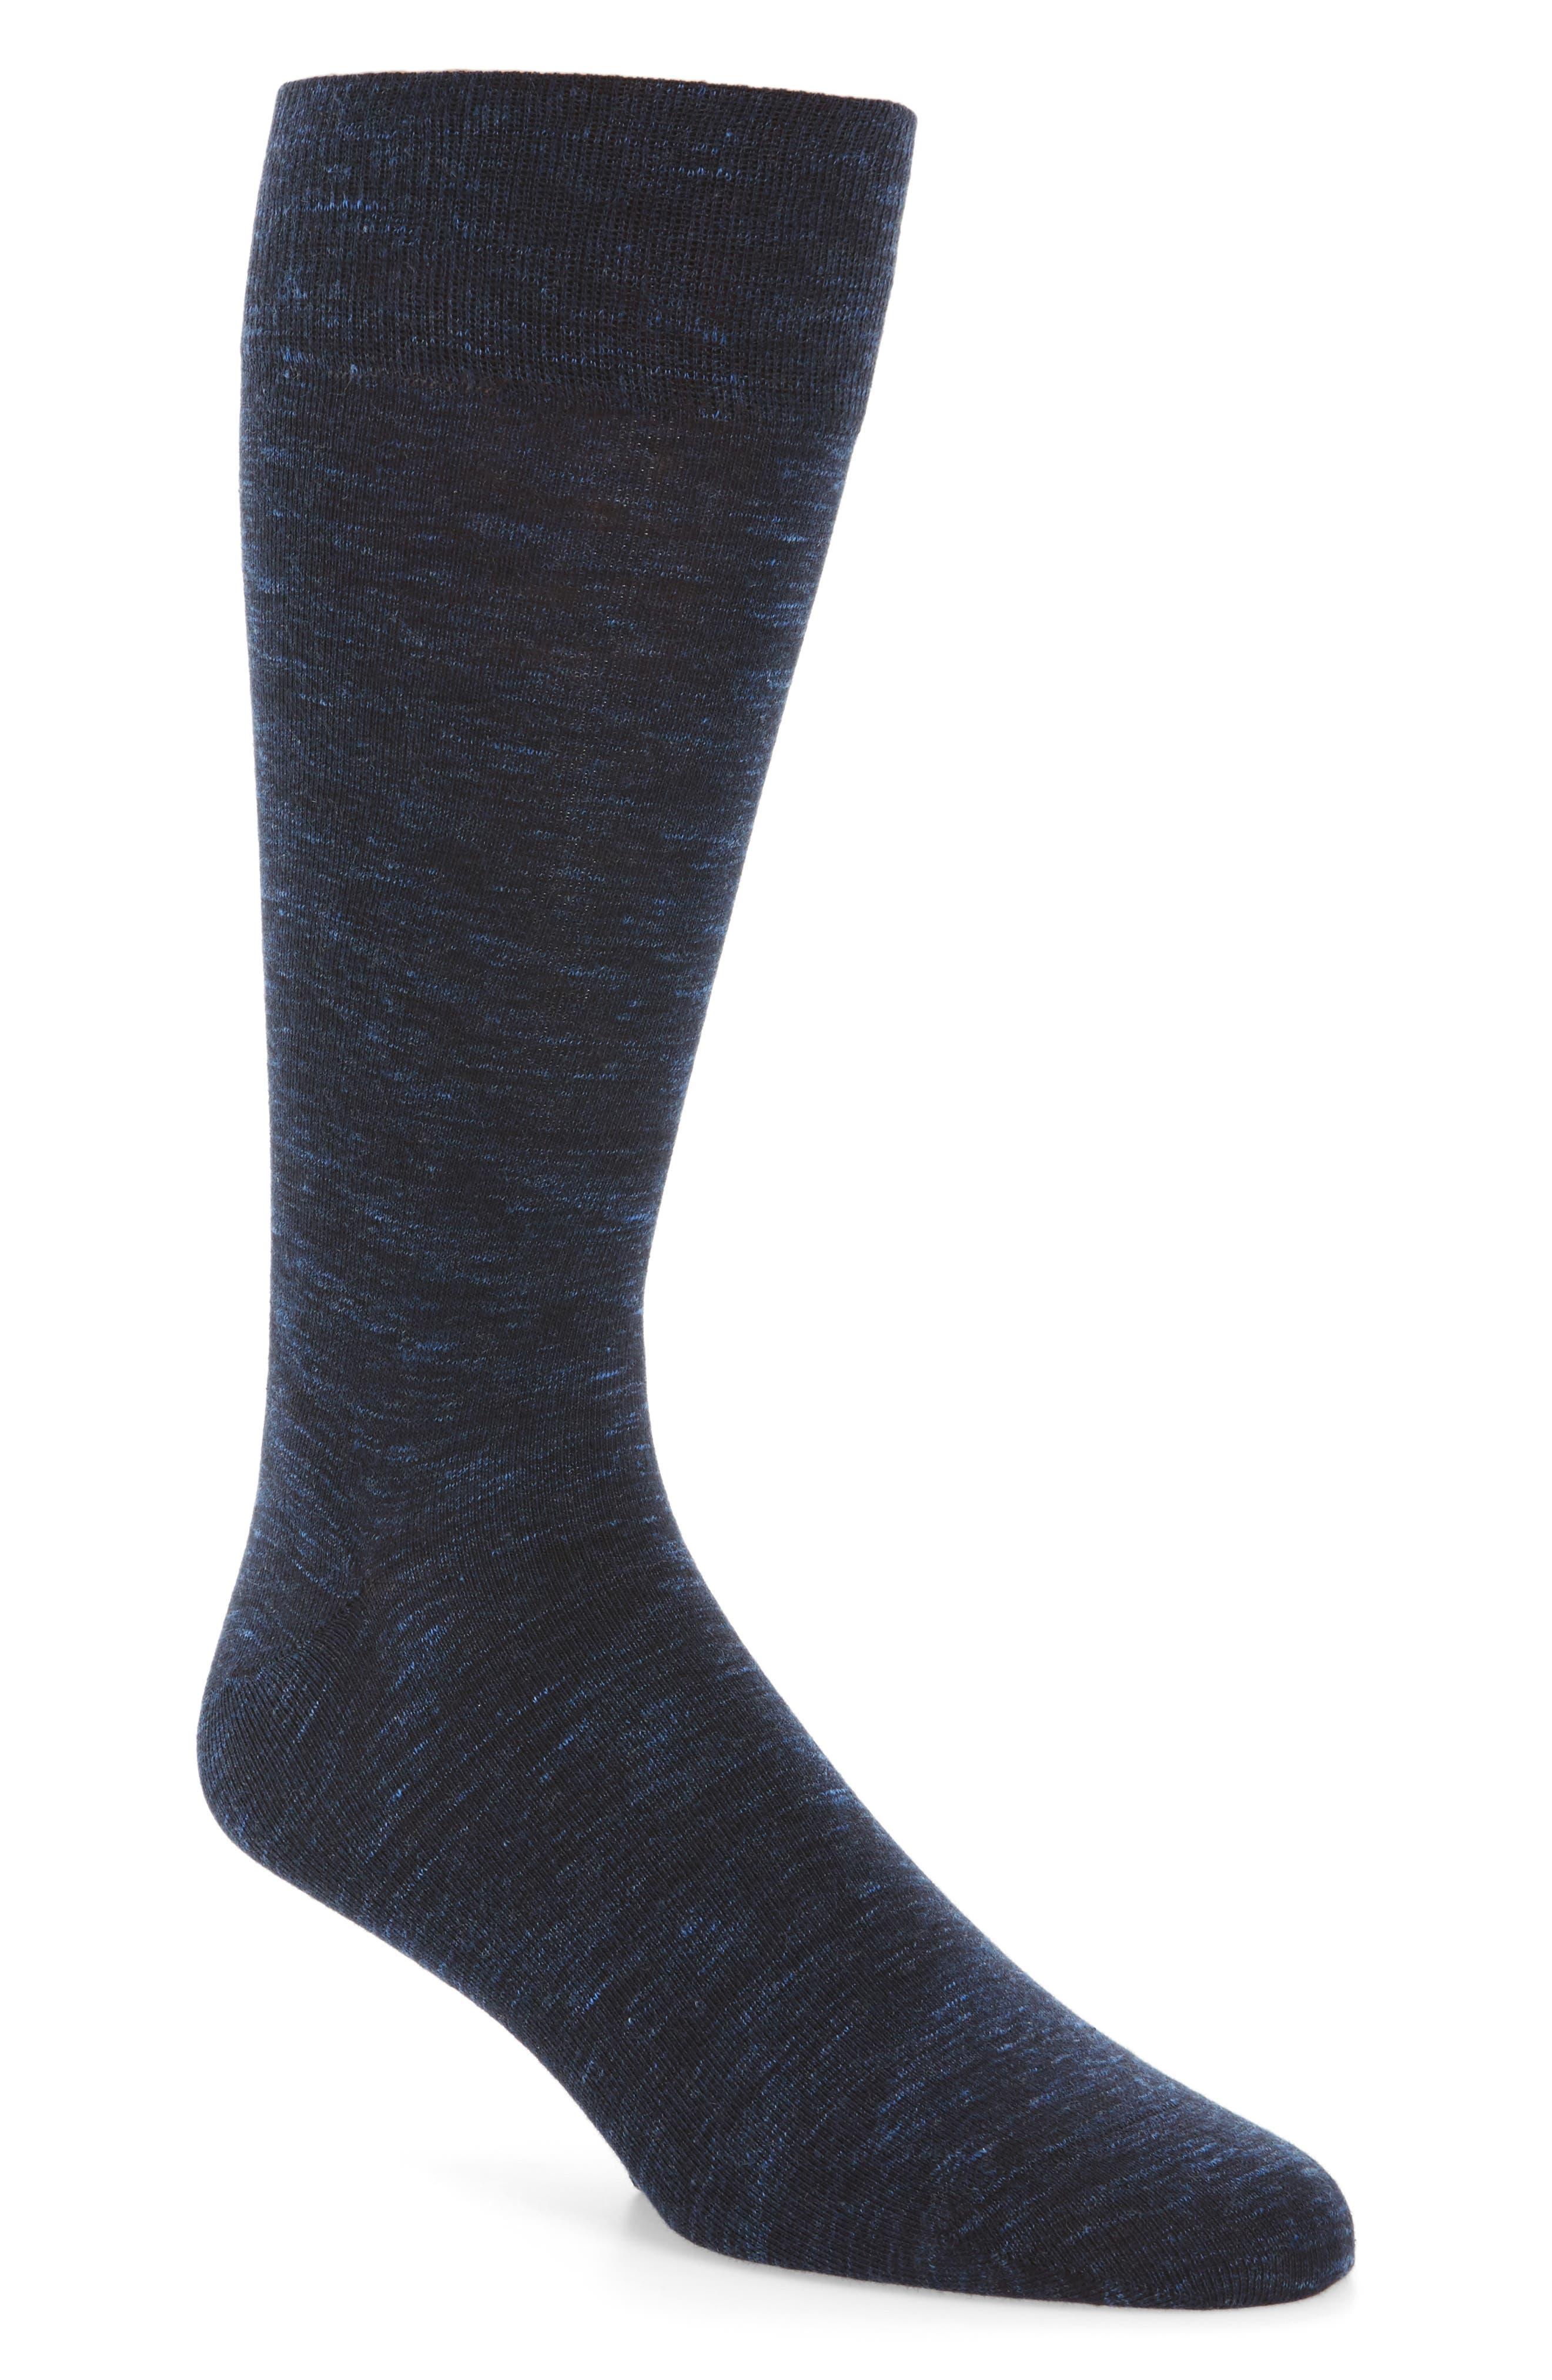 Twist Socks,                             Main thumbnail 1, color,                             Navy